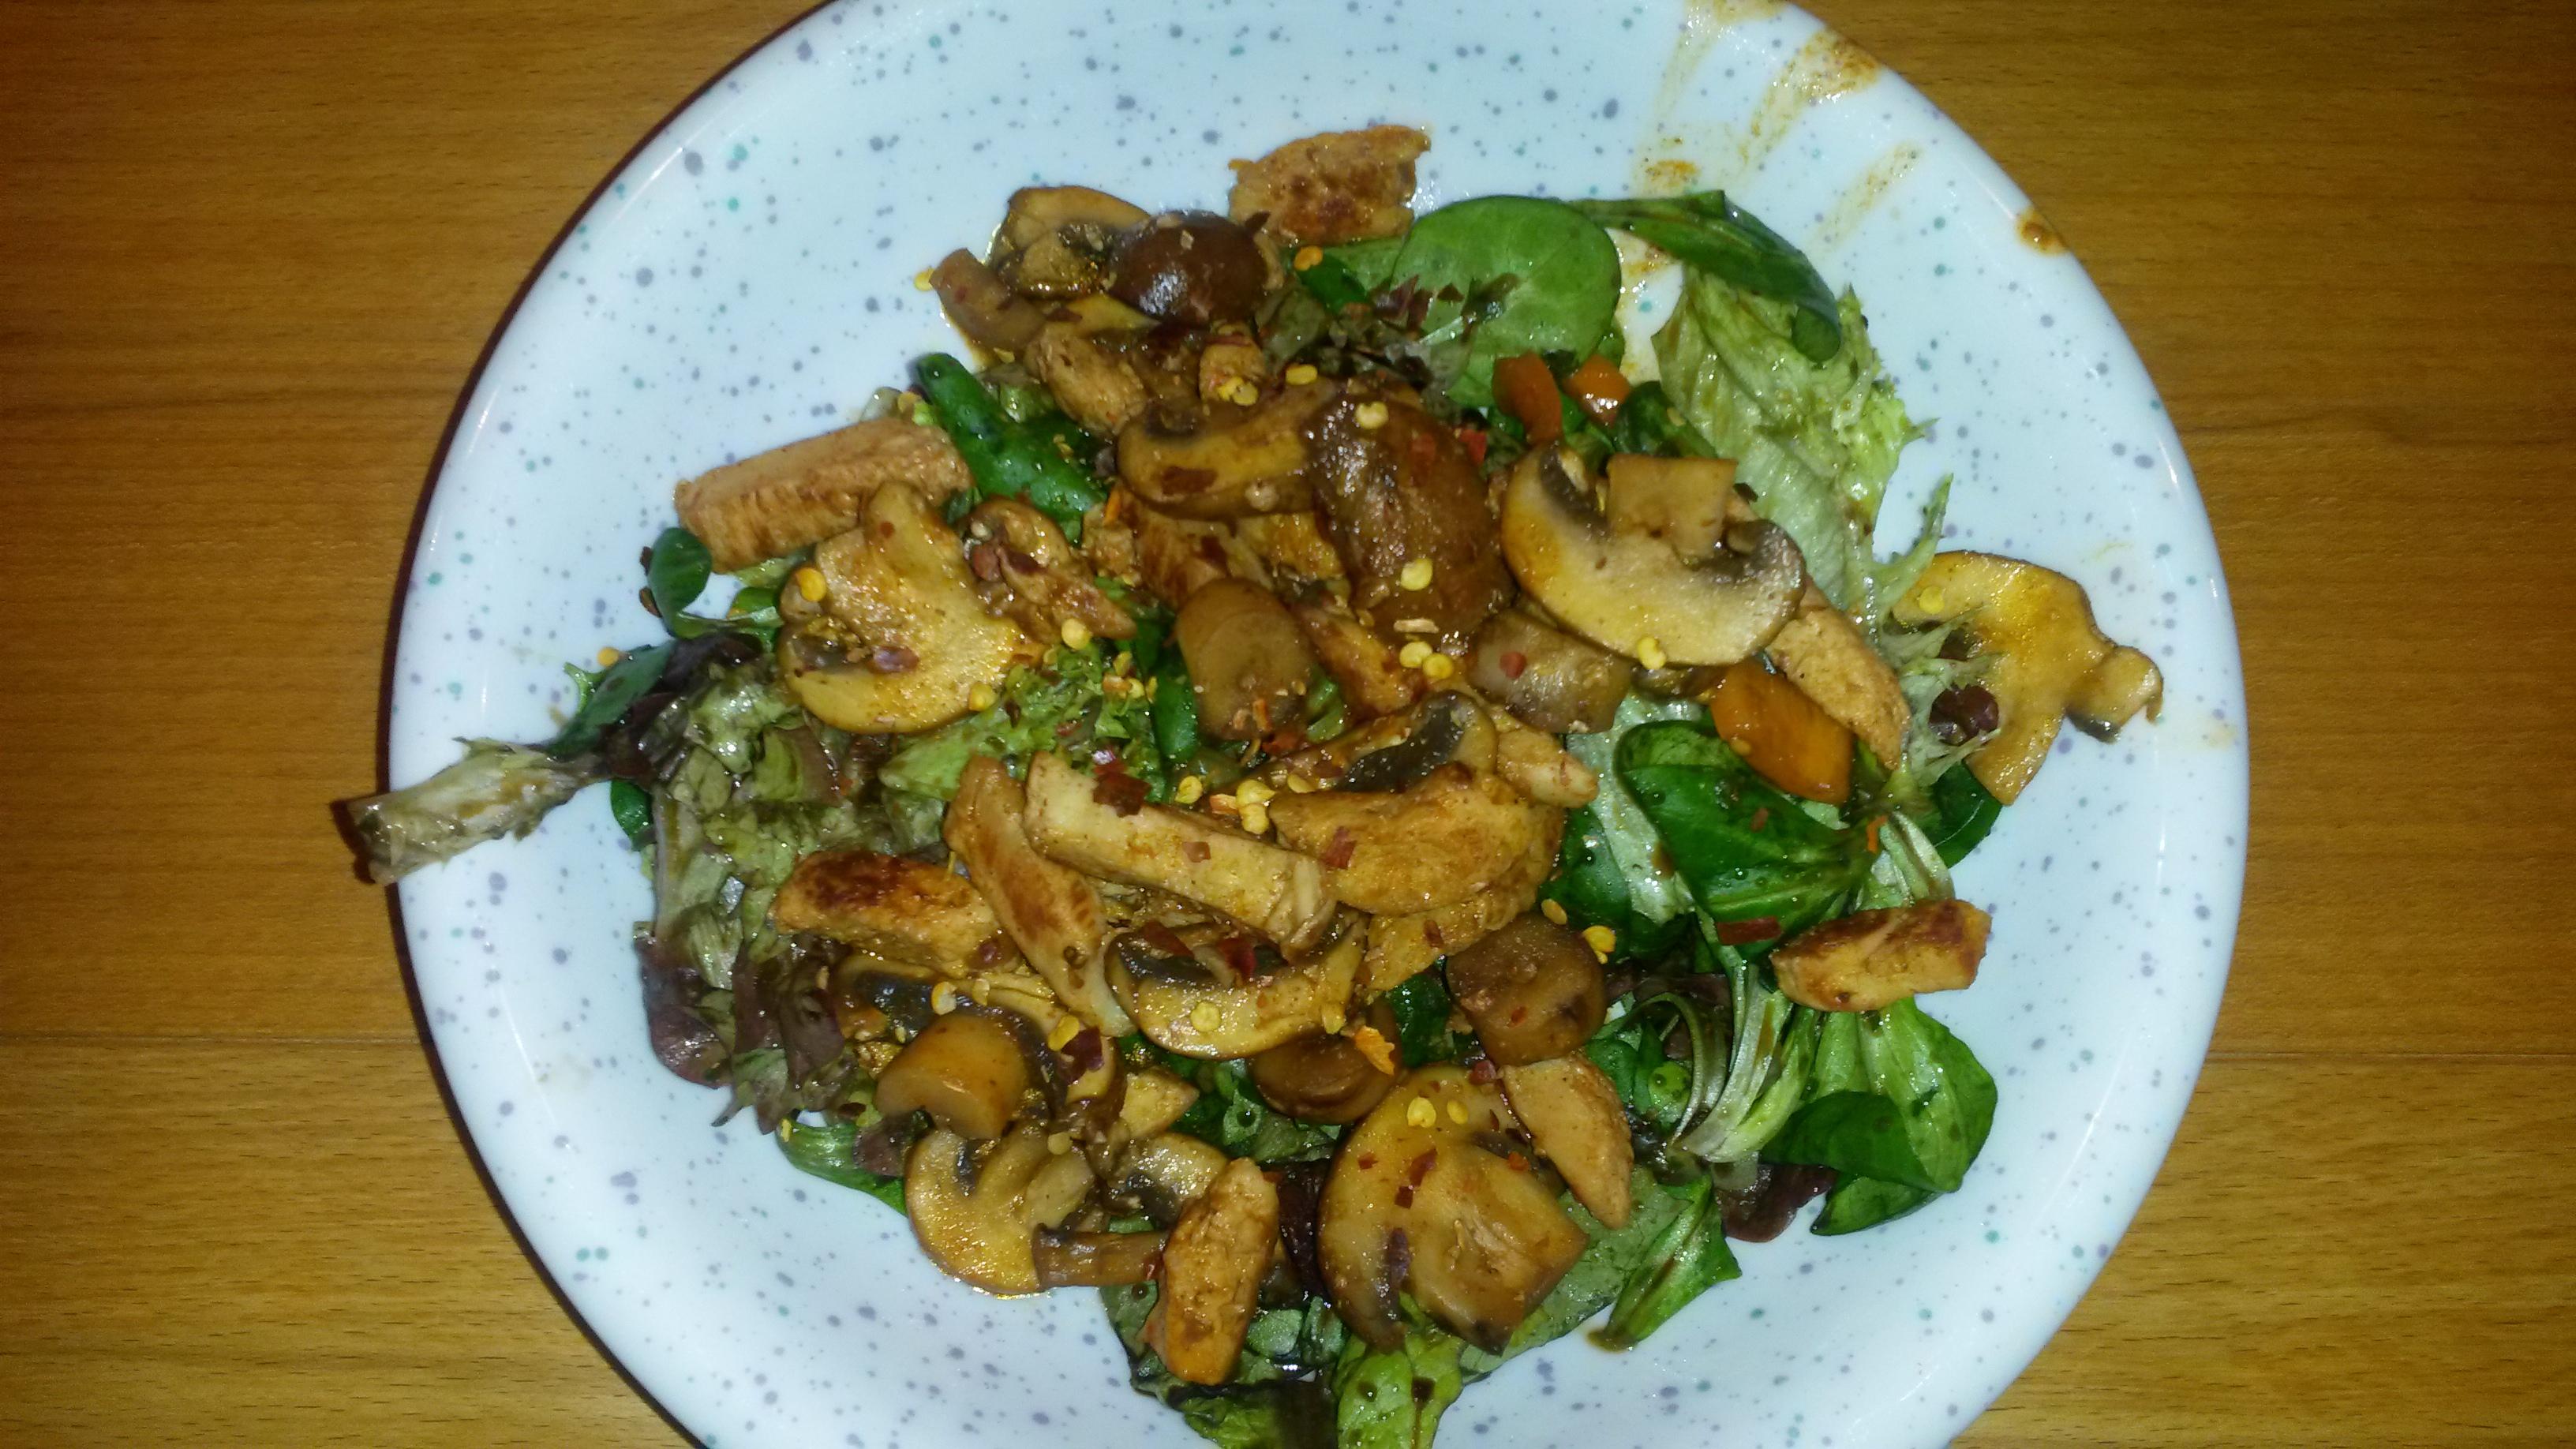 https://foodloader.net/sk0r_2014-03-08_Salat_mit_Haehnchenbruststreifen.jpg